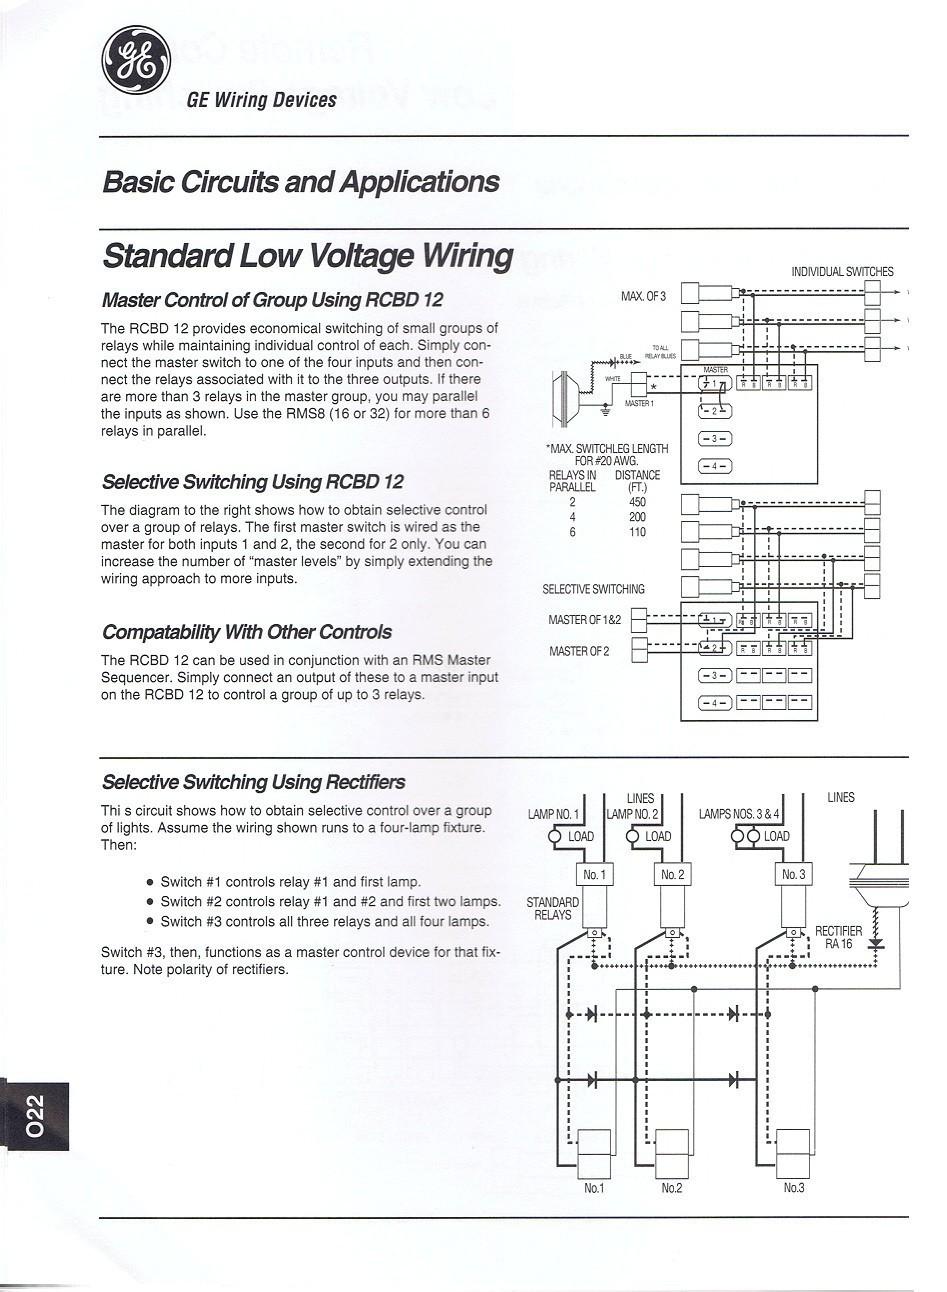 LY_6201] Ge Rr7 Relay Wiring Diagram Share The Knownledge Free Diagram   Ge Rr9 Wiring Diagram      Spoat Hapolo Hyedi Unpr Tomy Shopa Mohammedshrine Librar Wiring 101